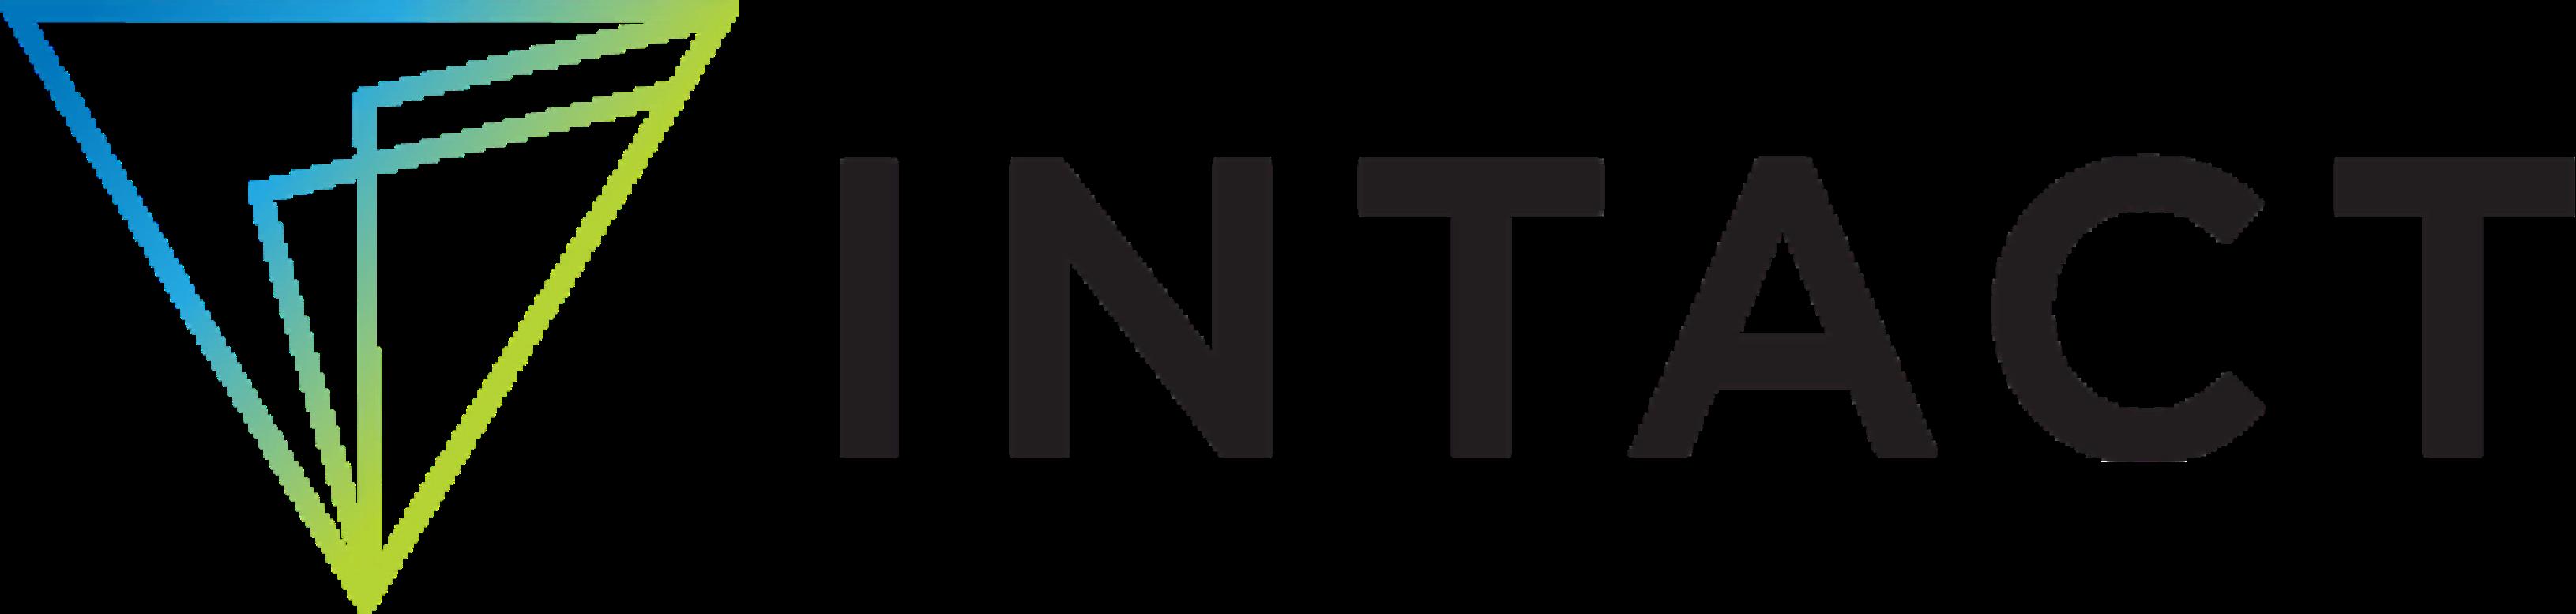 Platinum Sponsor - Intact - Logo